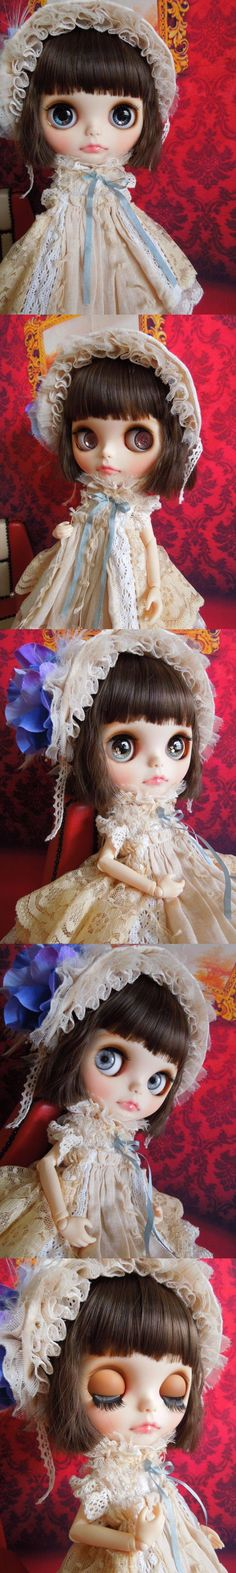 Custom Blythe Dolls: Aguri Custom Blythe Antique - A Rinkya Blog